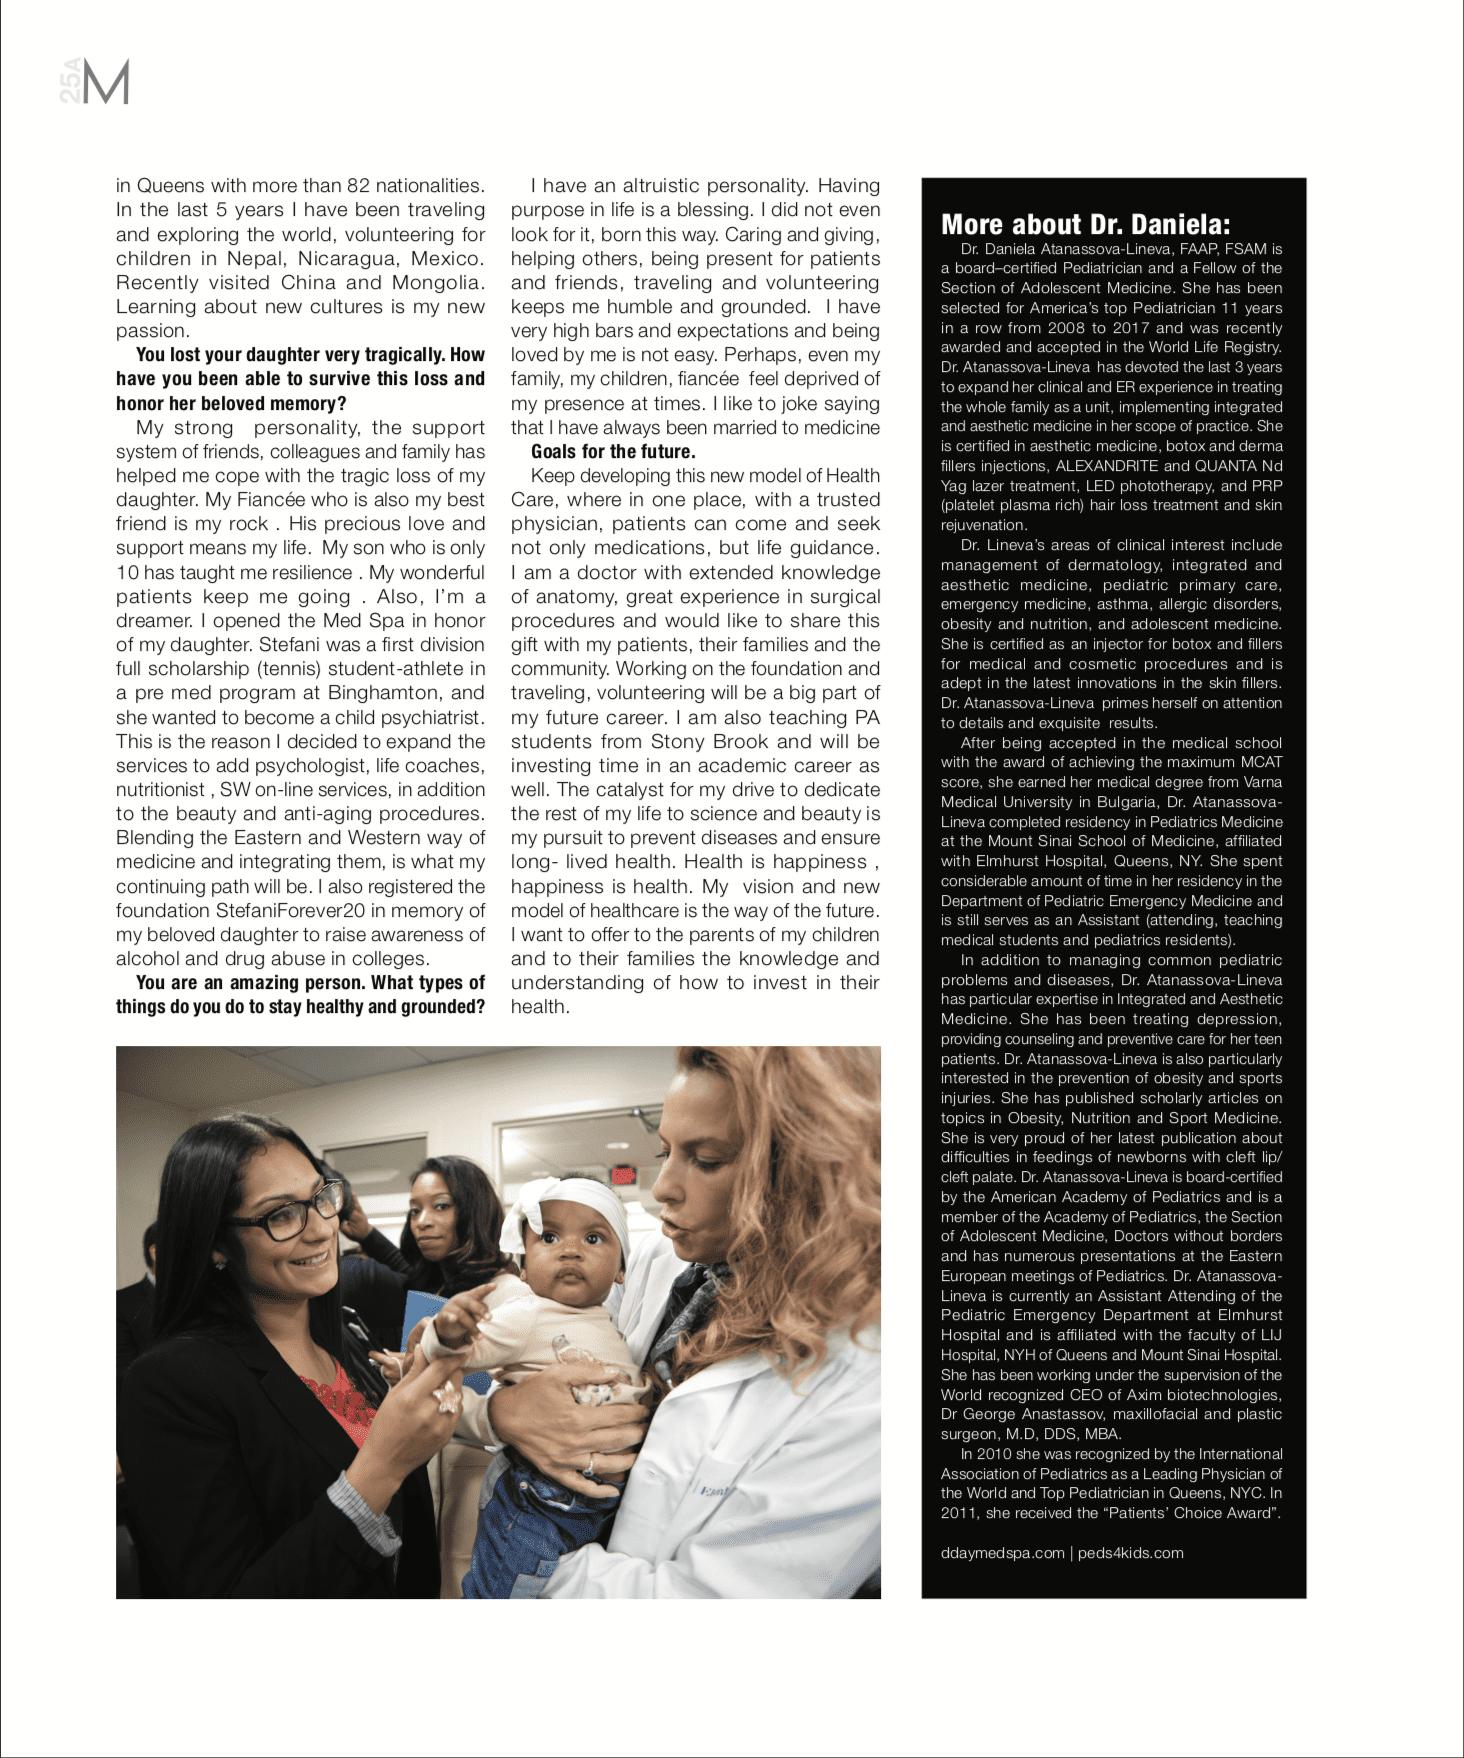 Peds 4 Kids: Pediatric and Adolescent Medicine: Rego Park, NY